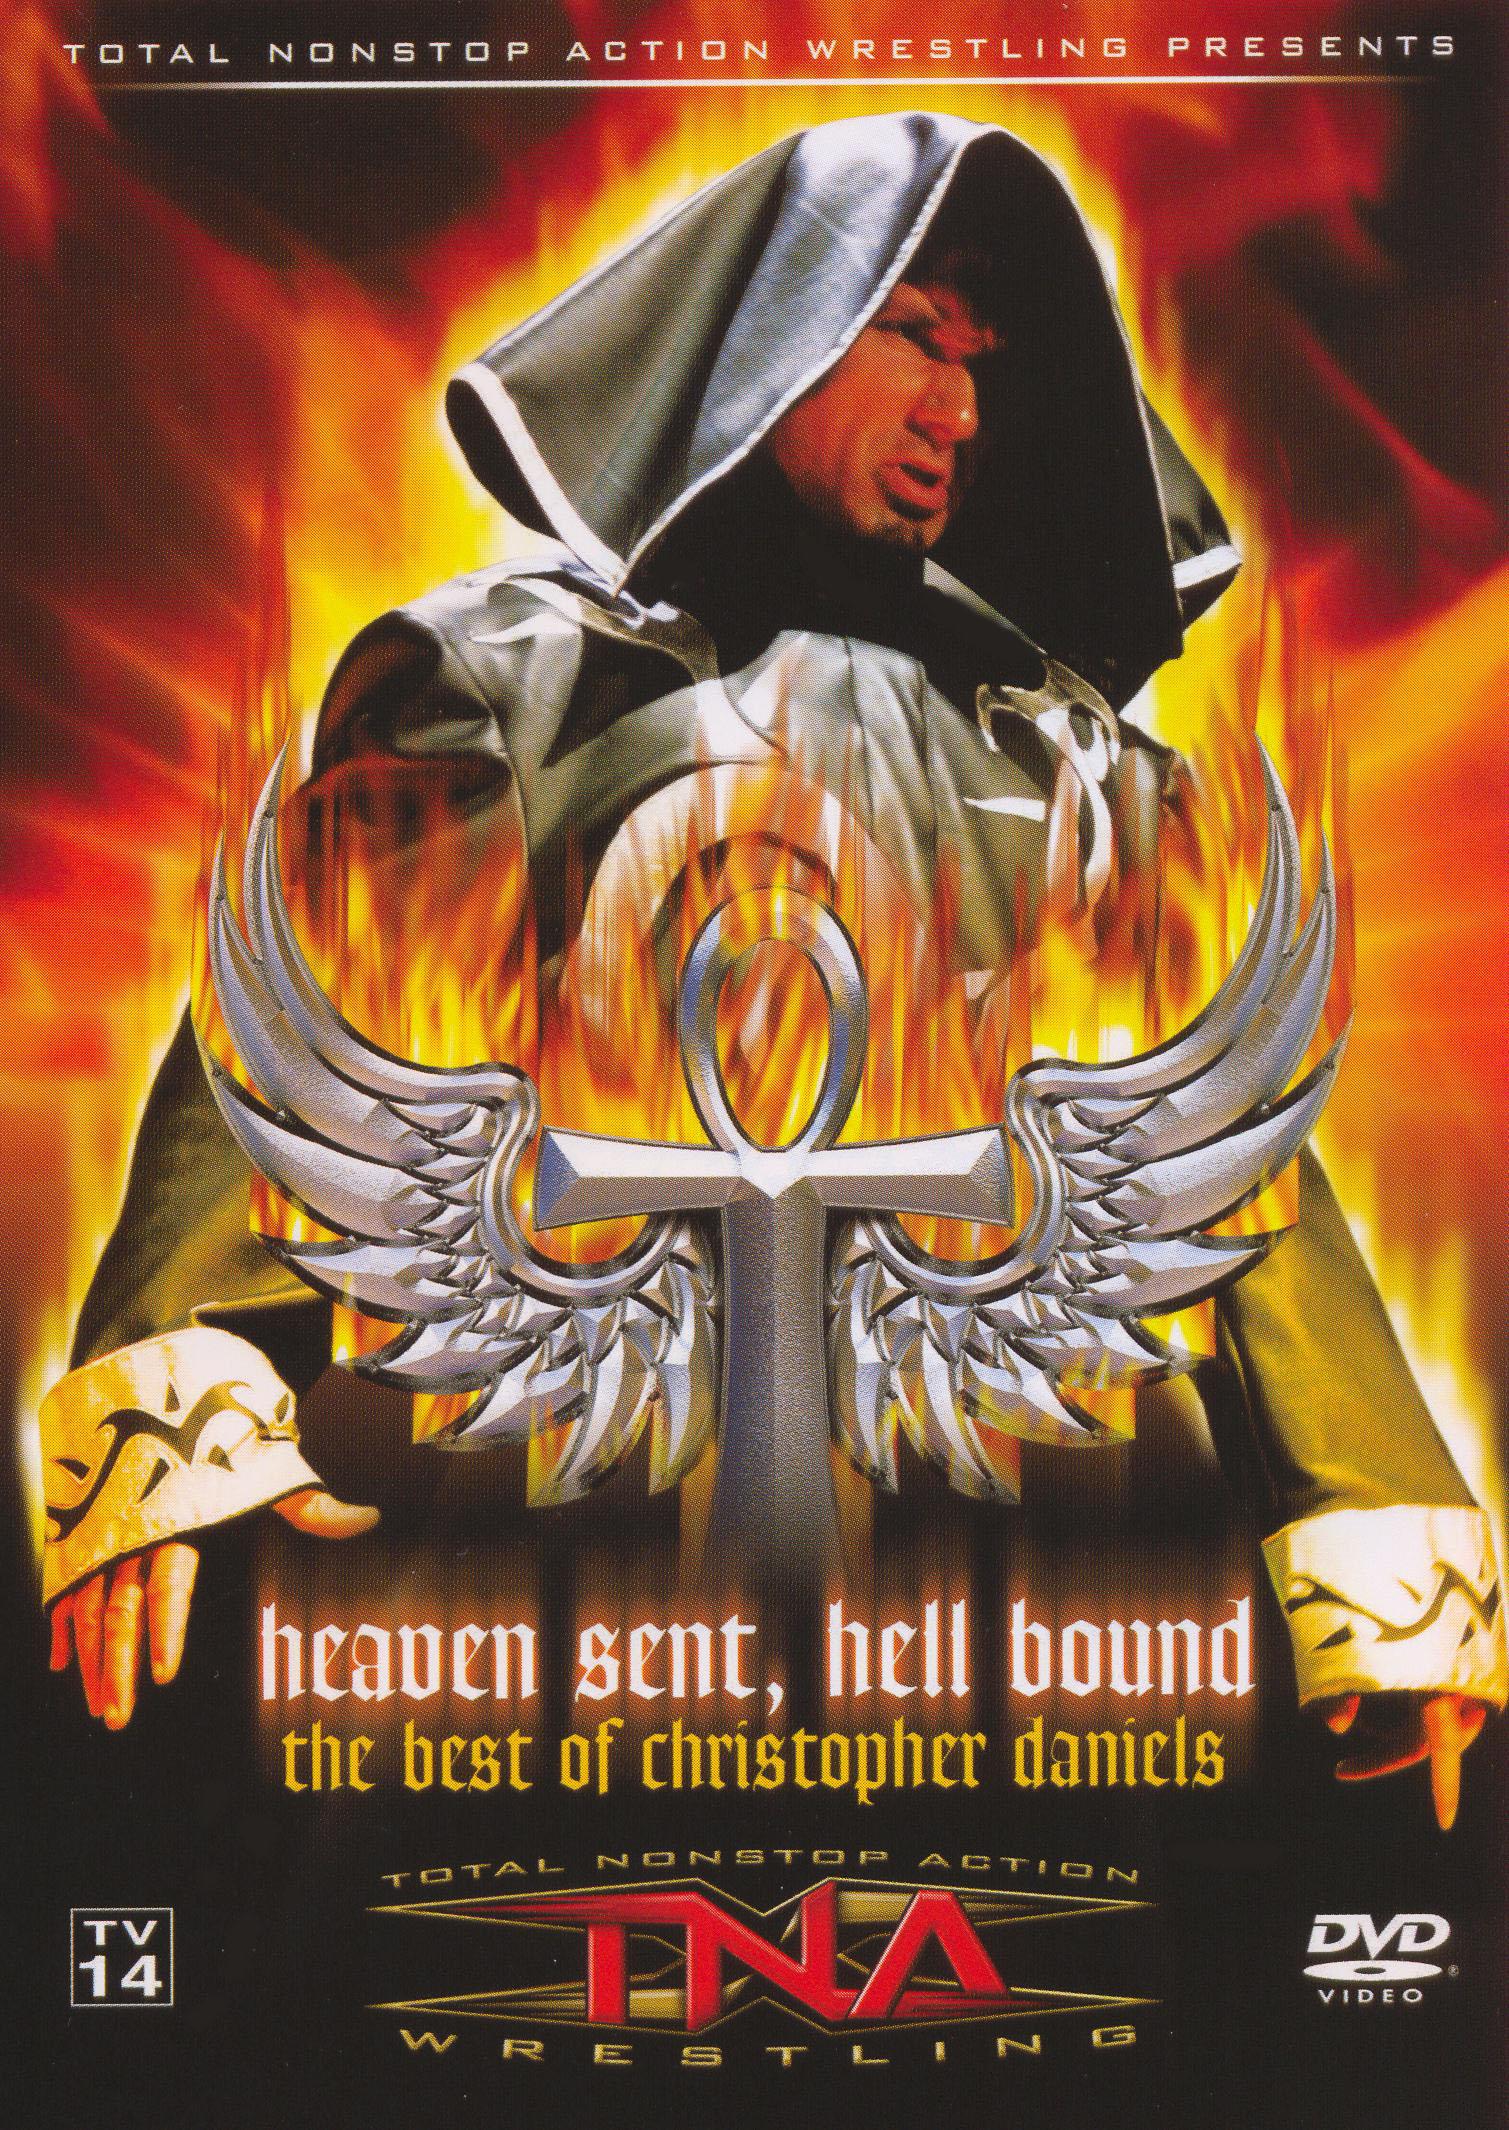 TNA Wrestling: Heaven Sent, Hell Bound